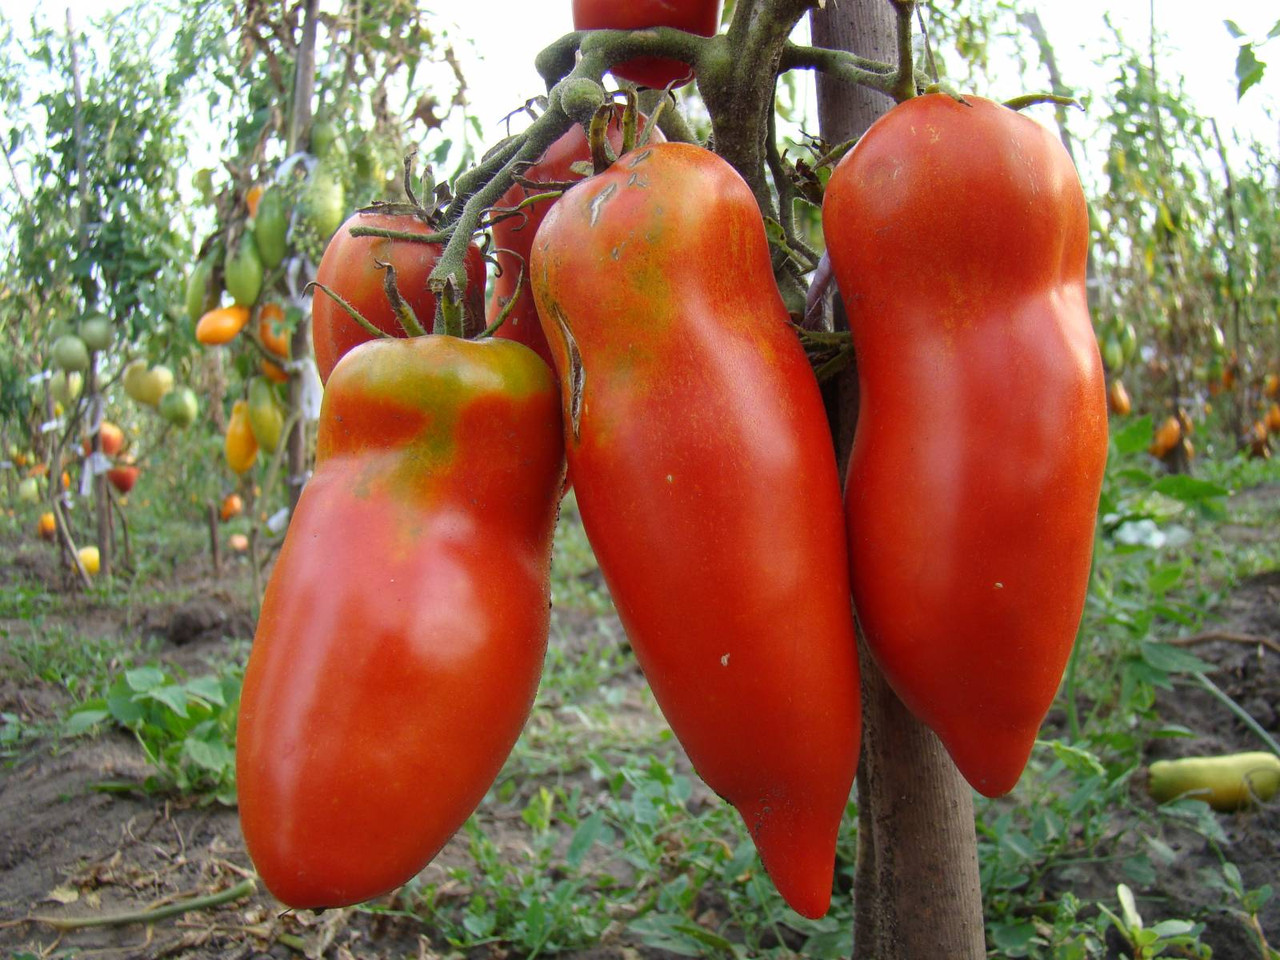 томат алый мустанг характеристика и описание сорта